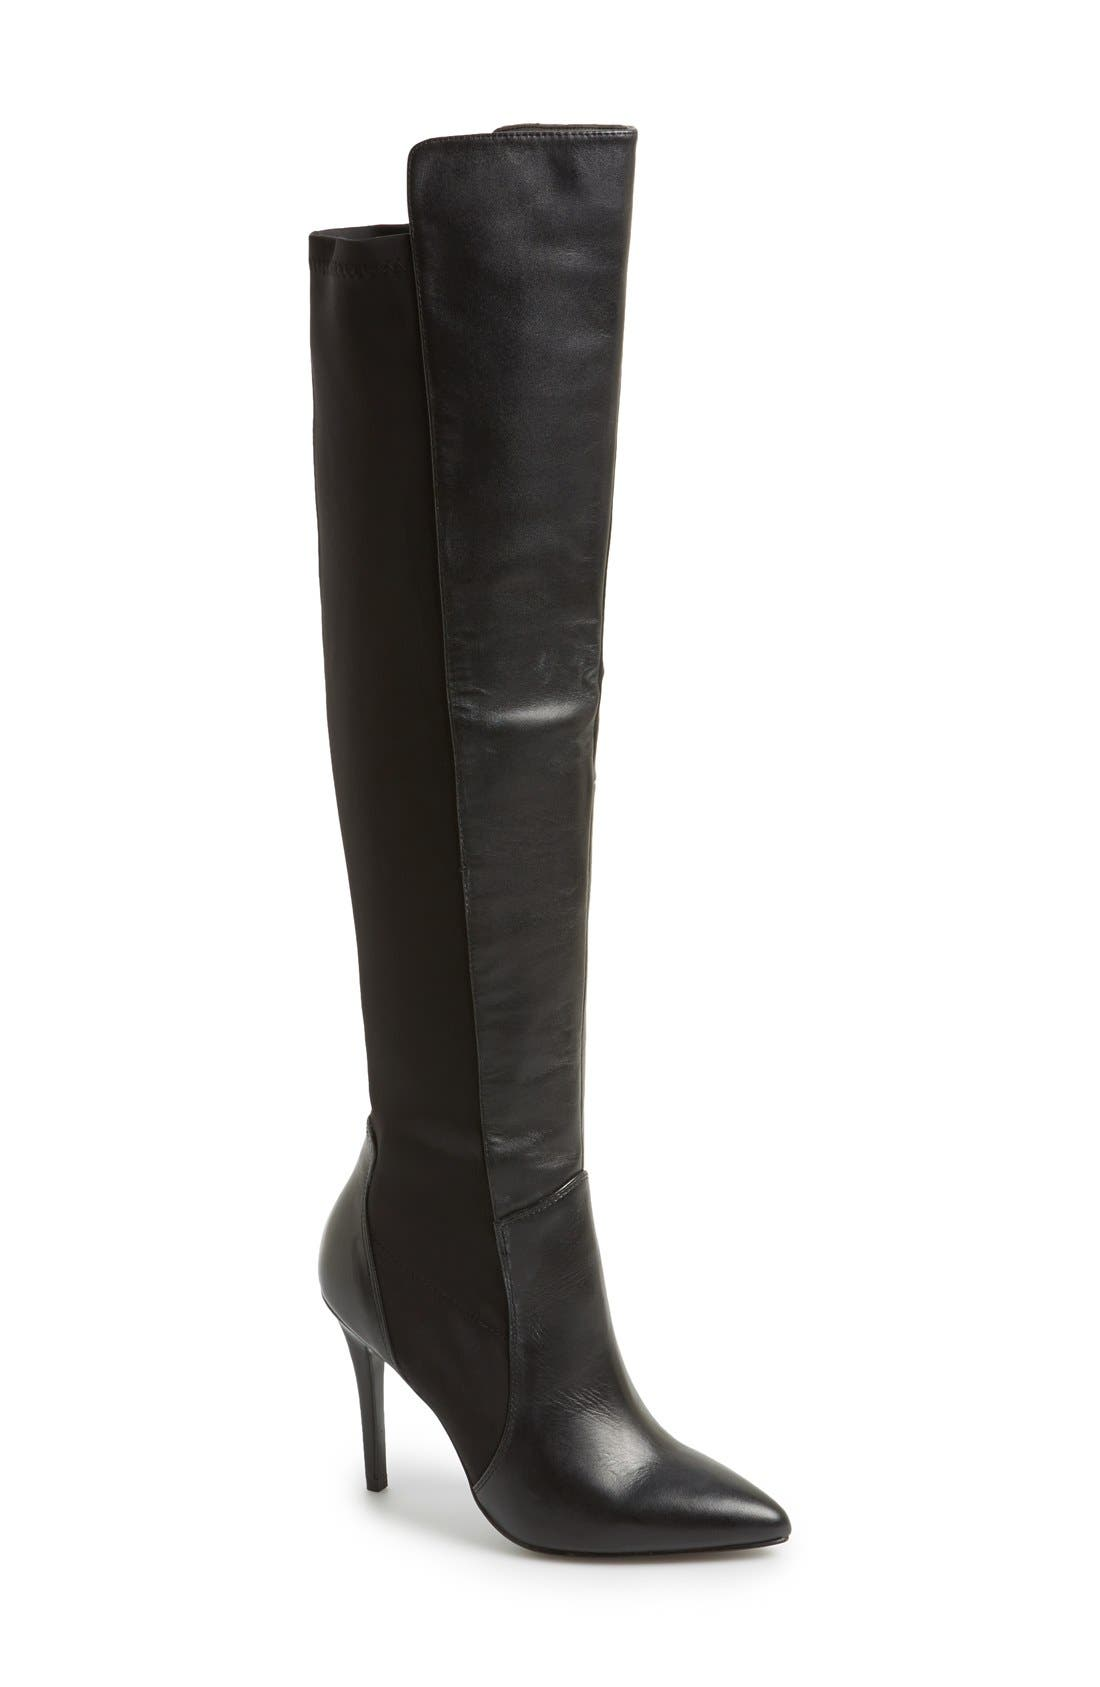 Alternate Image 1 Selected - Charles David 'Persona' Tall Boot (Women)